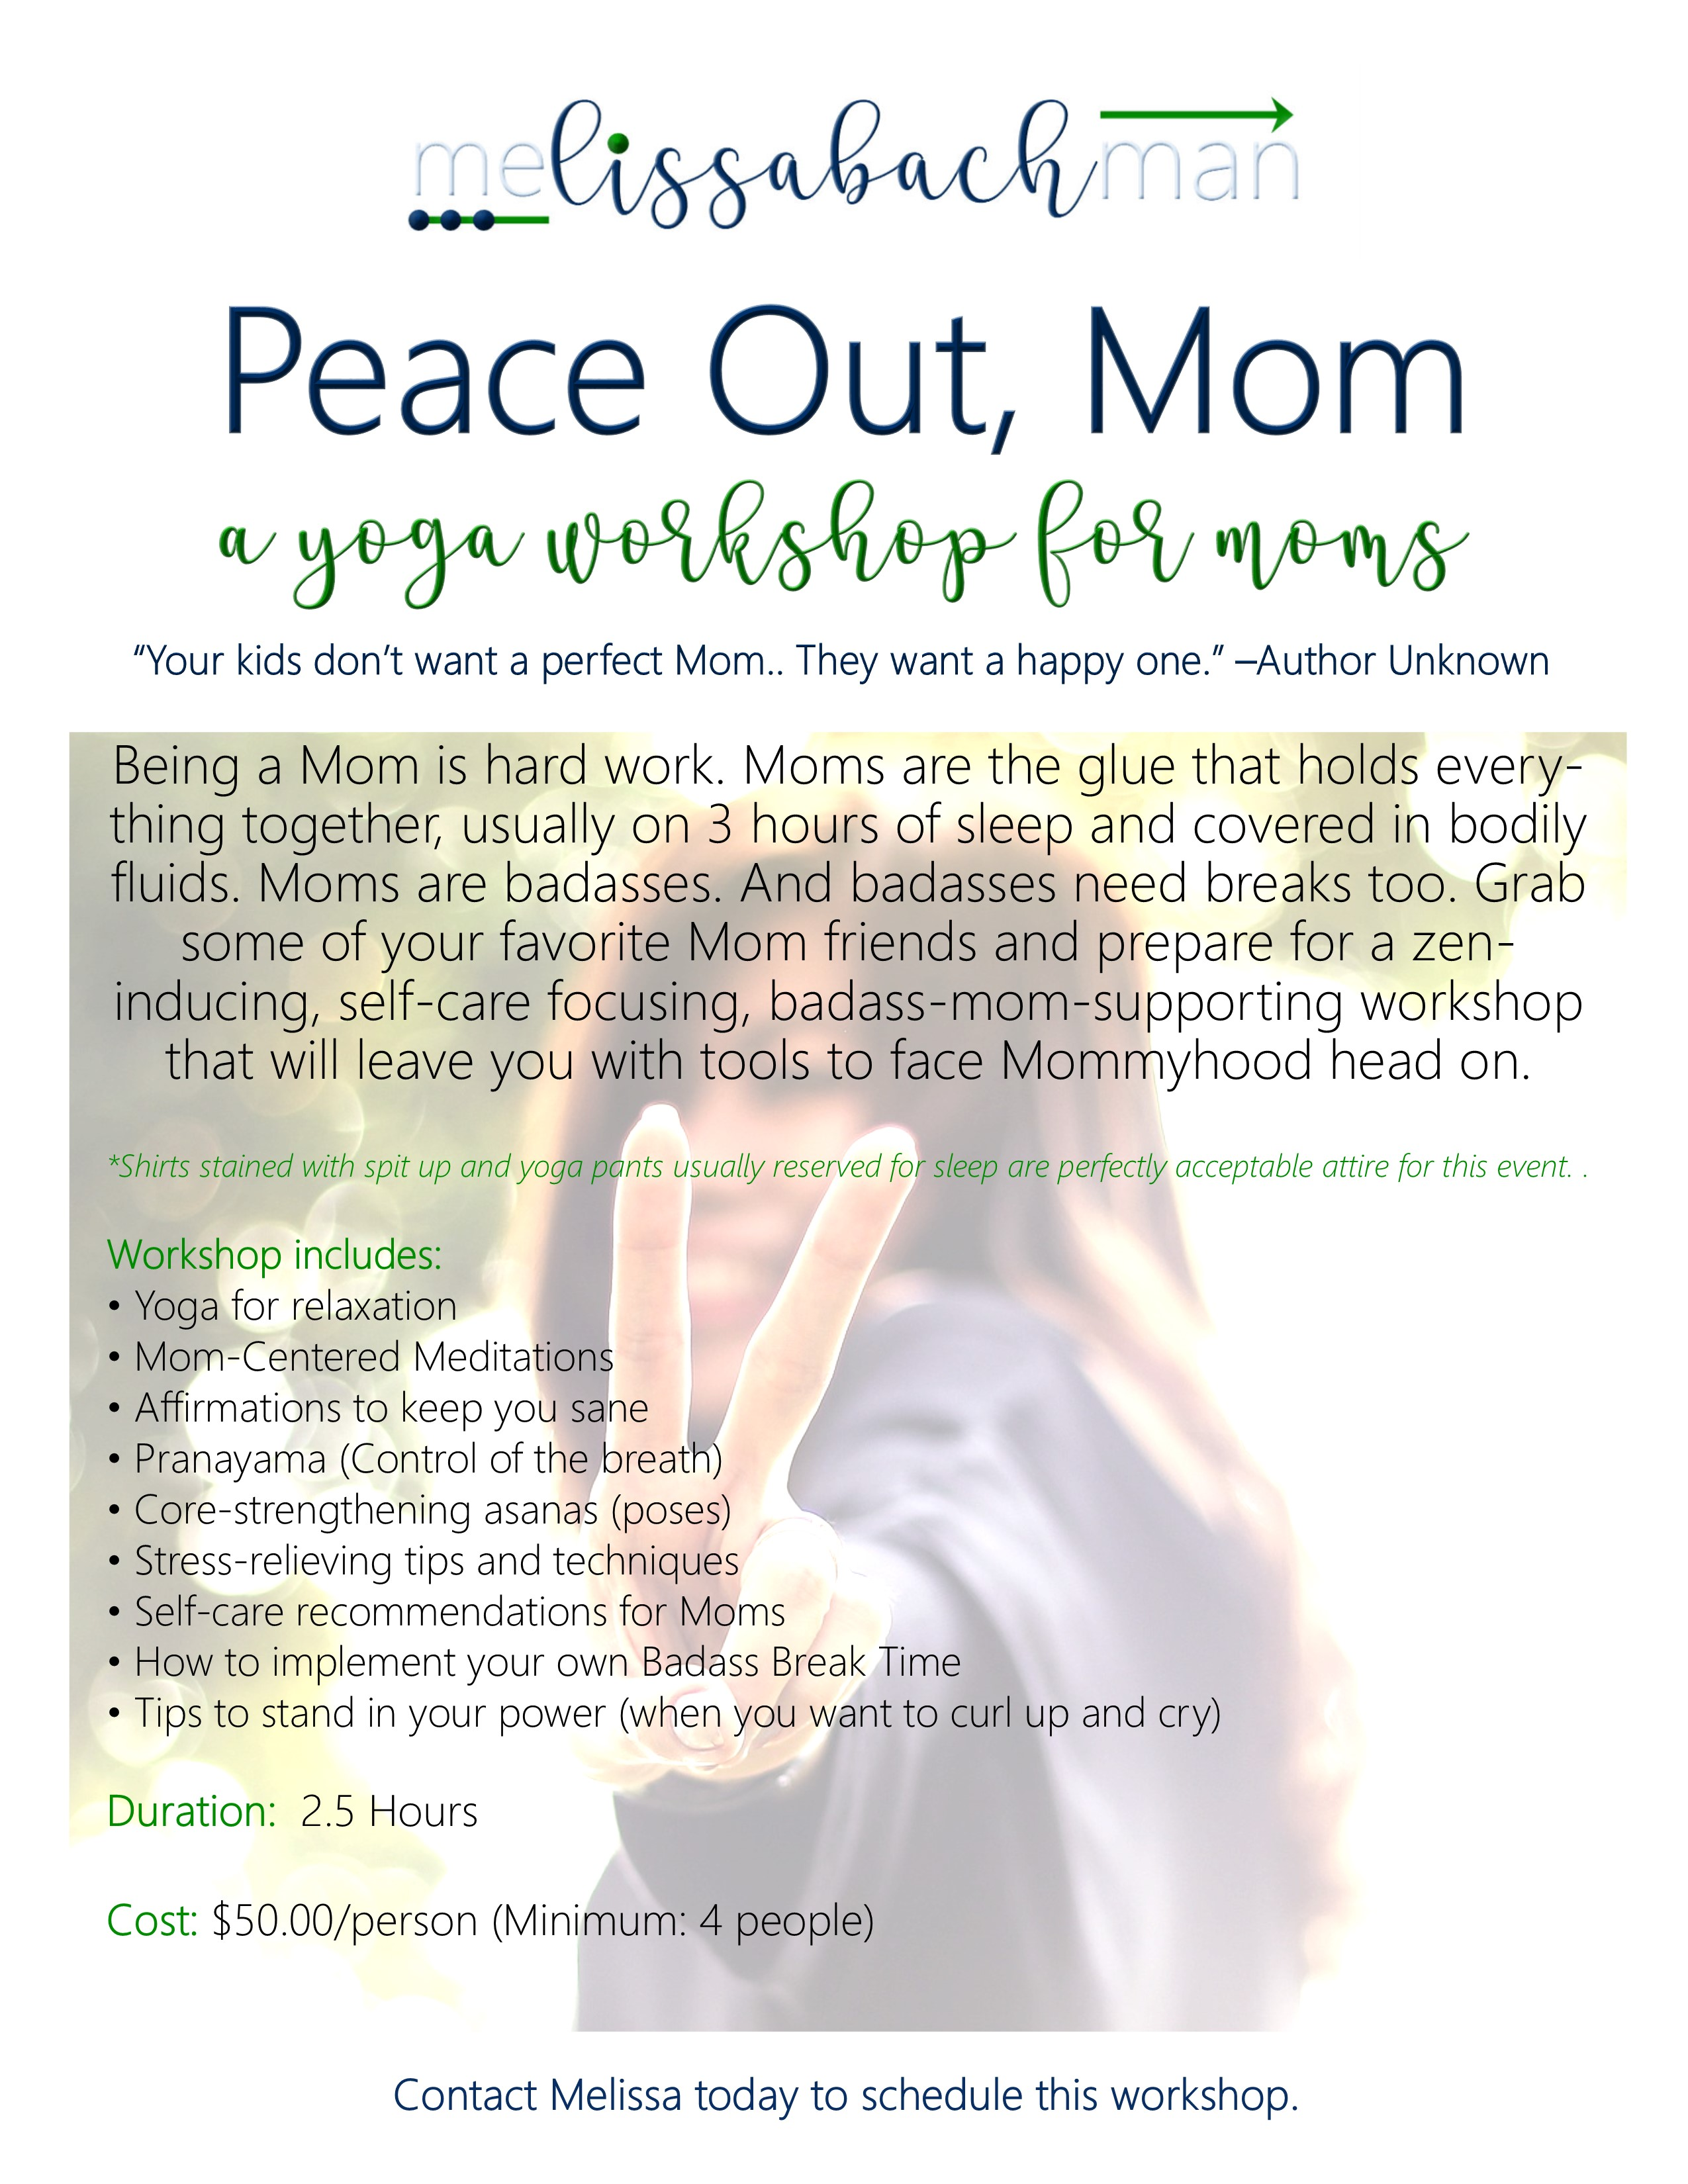 Peace Out, Mom Workshop WEBSITE